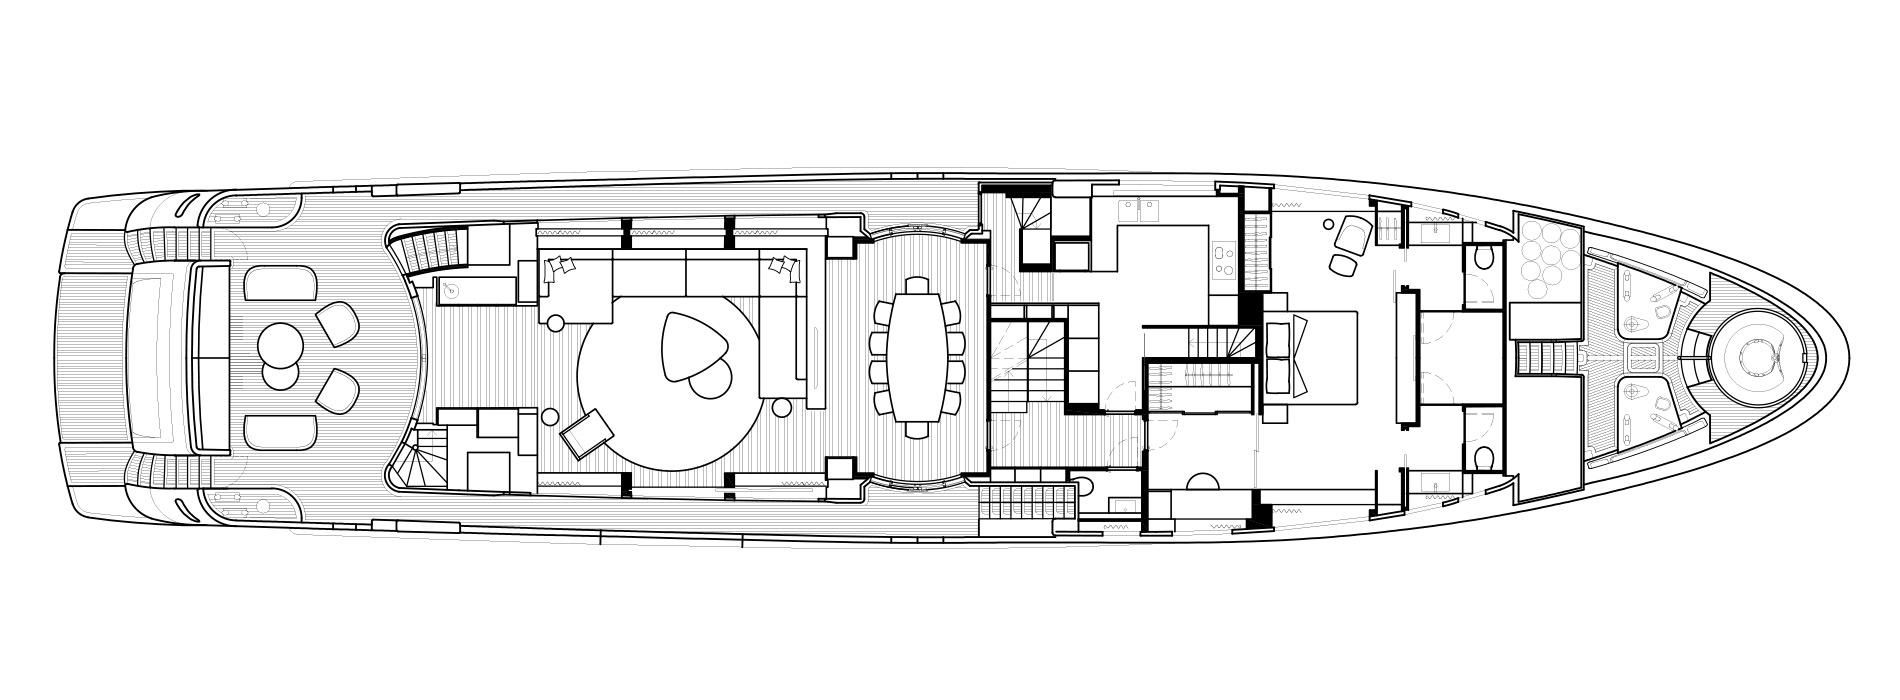 Sanlorenzo Yachts SD126 Главная палуба версия B